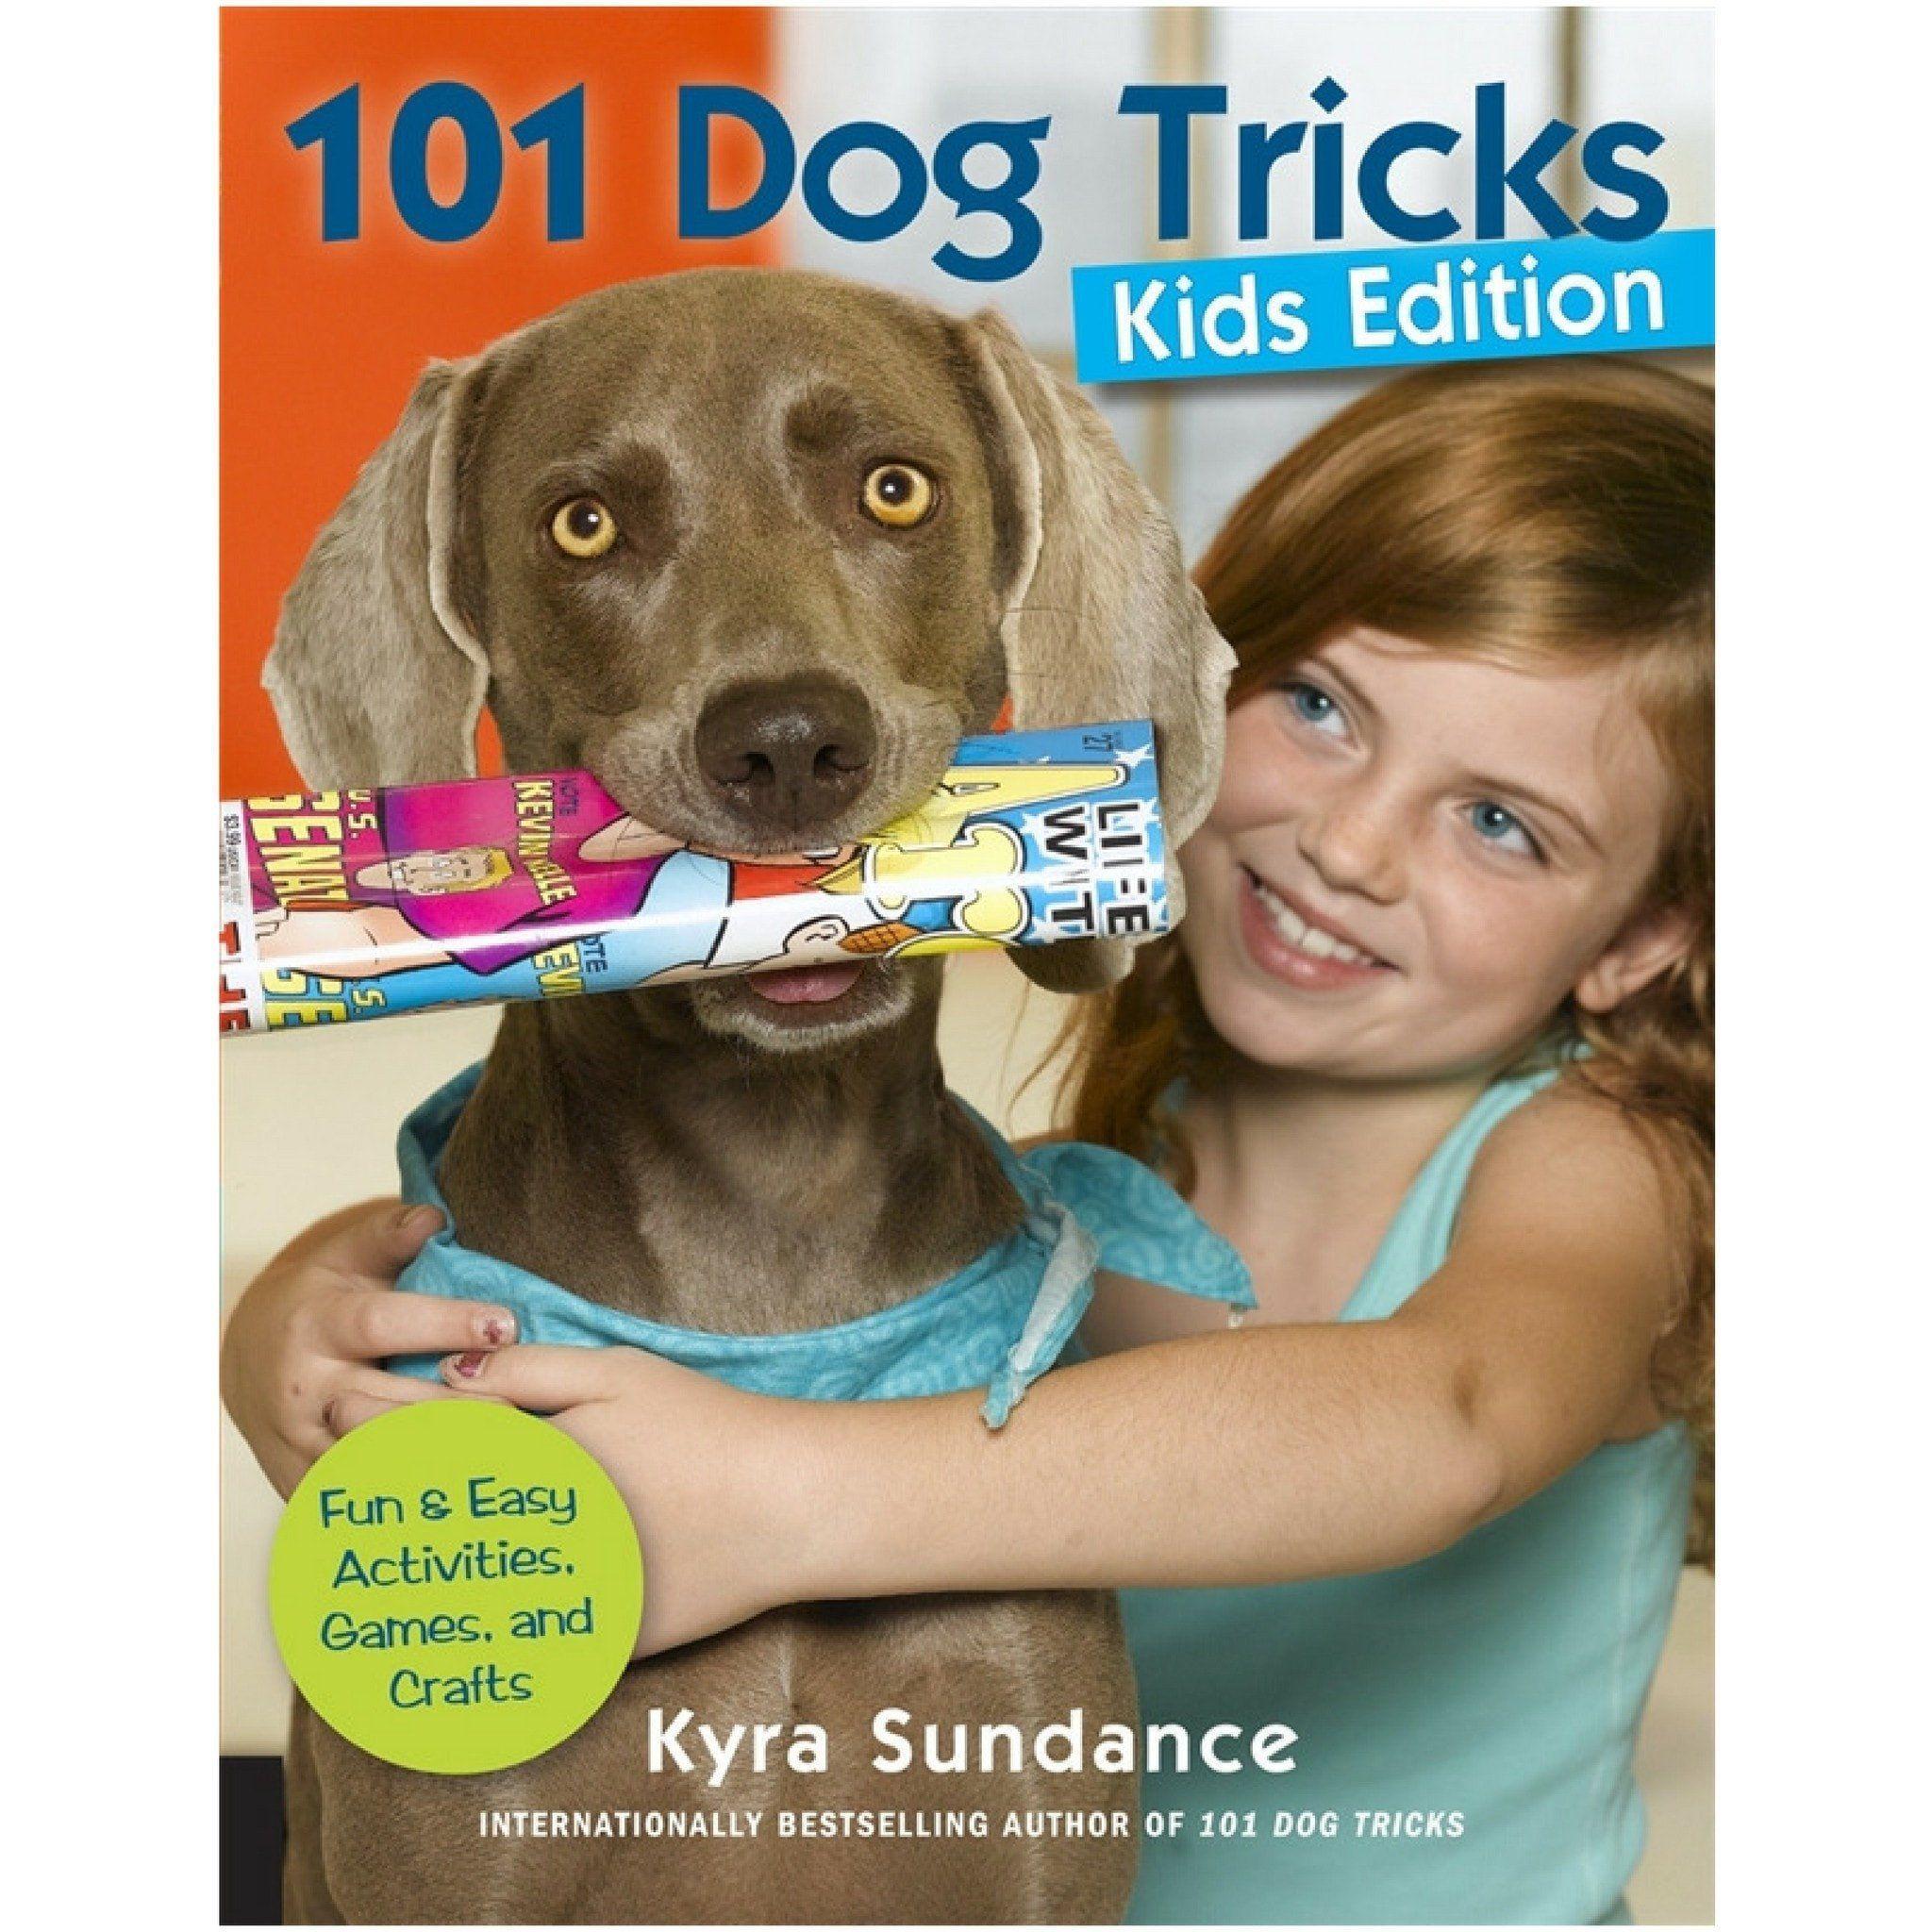 101 Dog Tricks: Kids Edition